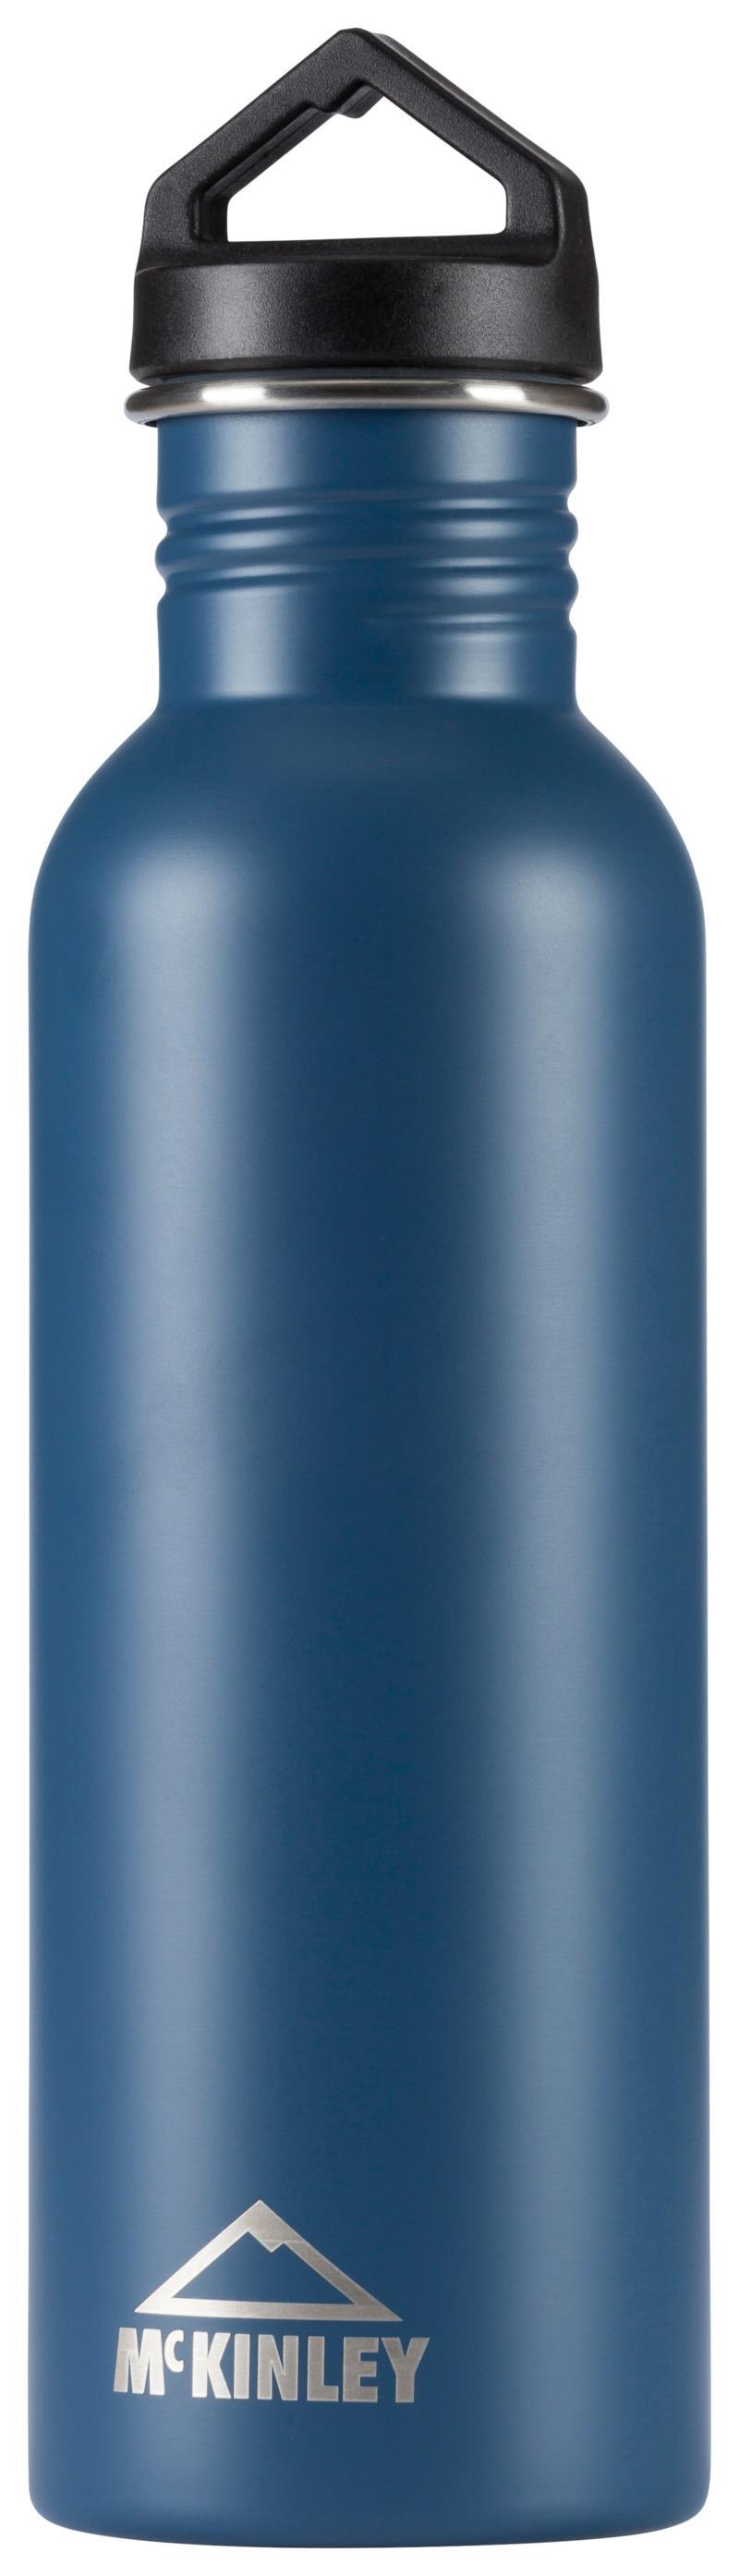 McKinley STAINLESS STEEL SINGLE SCREW 0,75L, boca kamp, plava